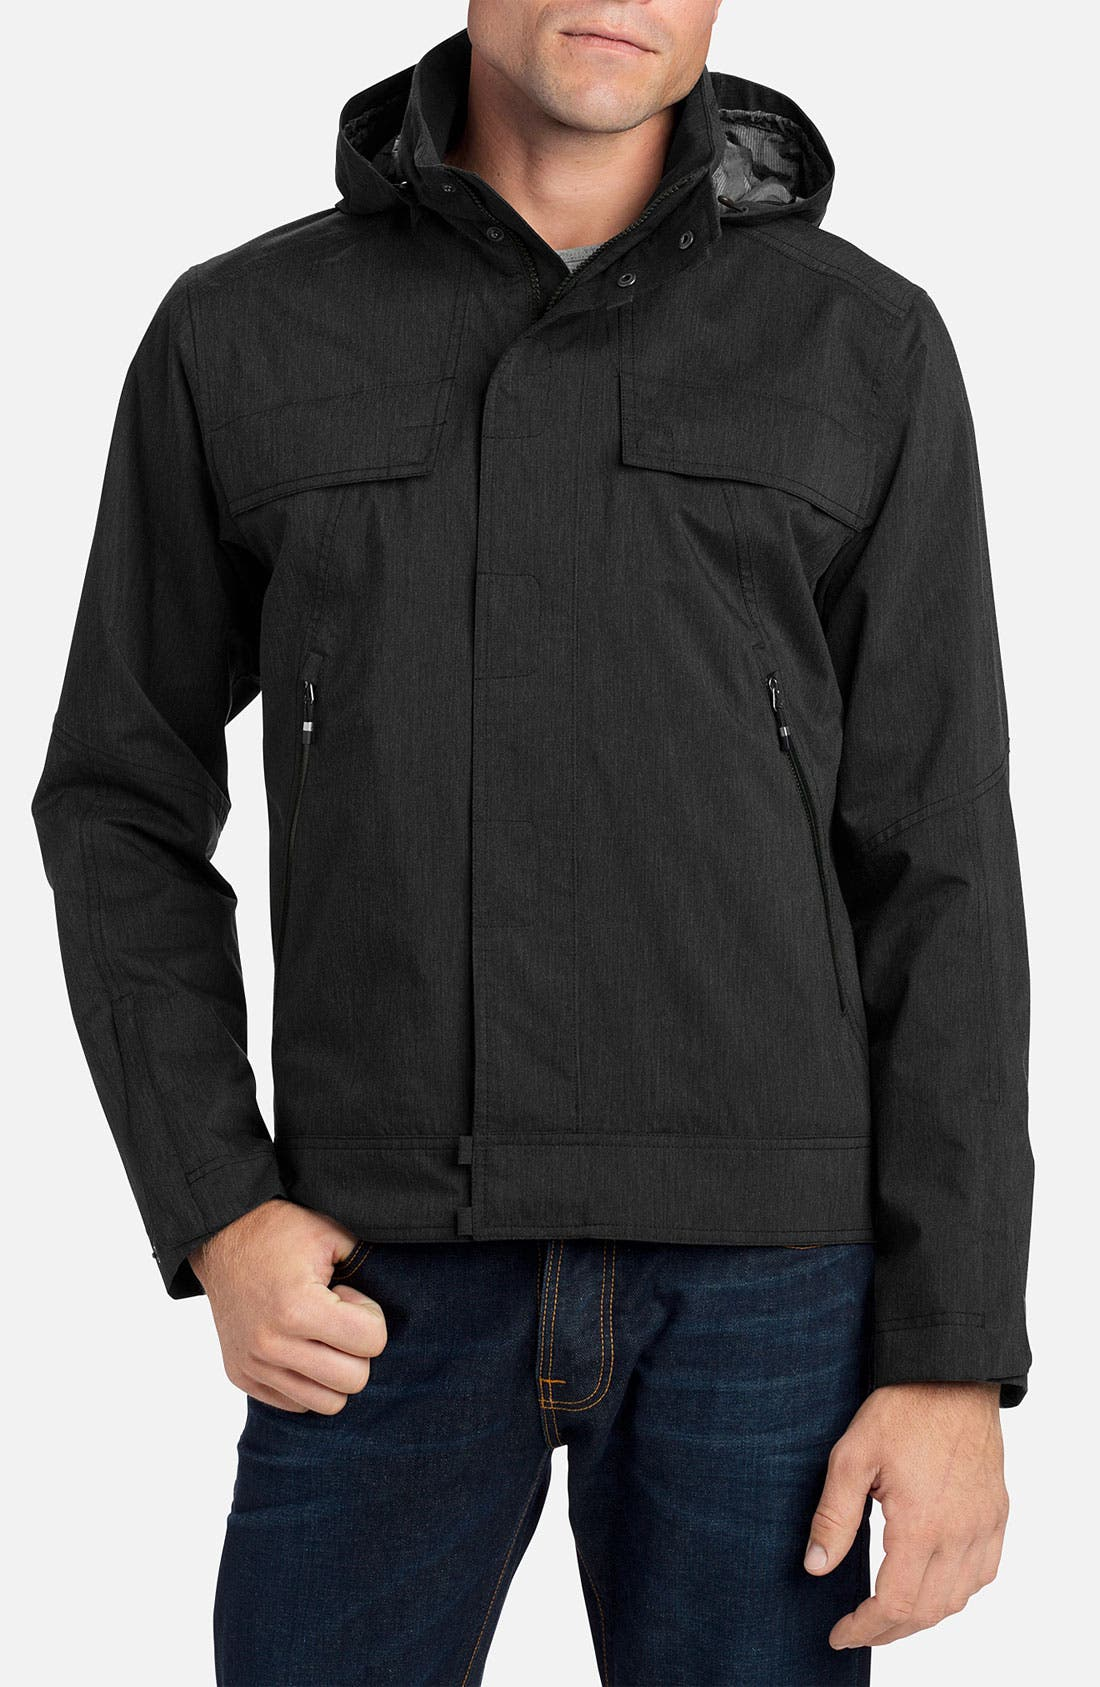 Alternate Image 1 Selected - Nau 'Urbane II' Jacket